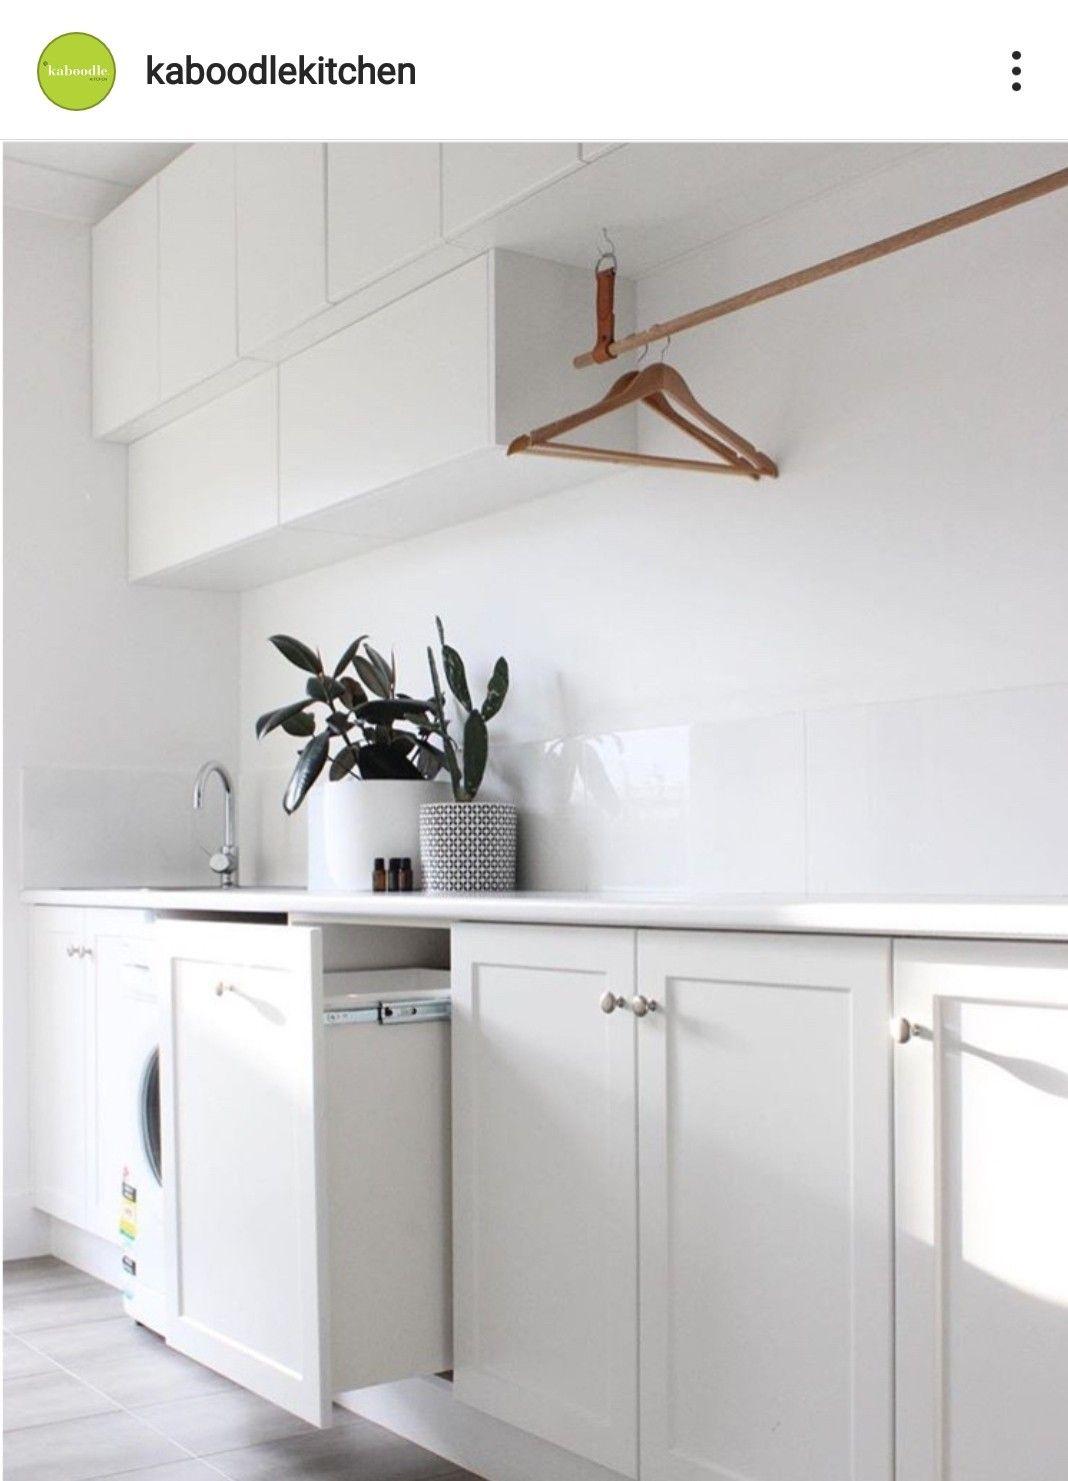 pin by eliane boustani on laundry kaboodle kitchen bunnings modern laundry rooms laundry design on kaboodle kitchen bunnings drawers id=54273